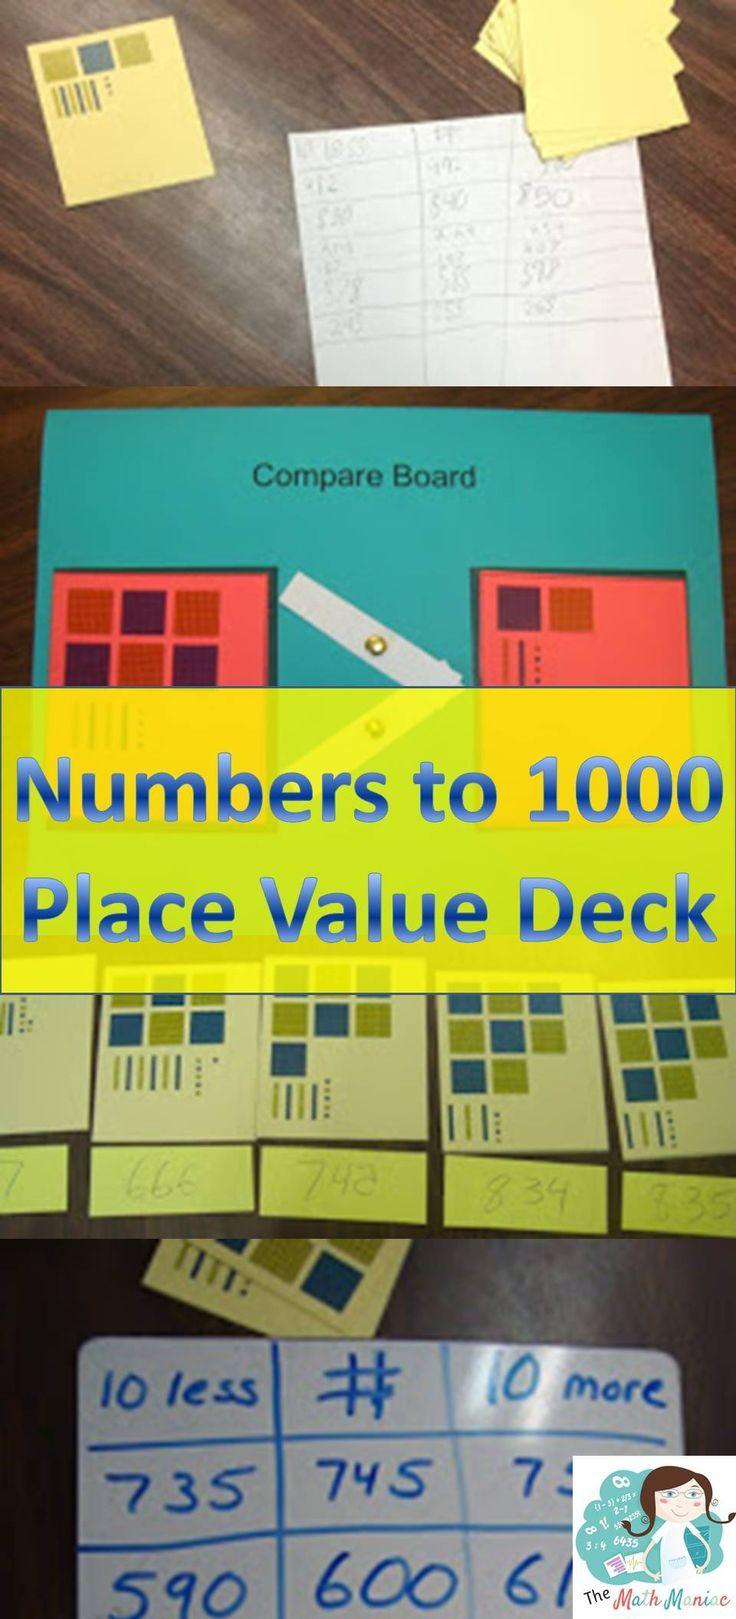 confluence how to use decks cards